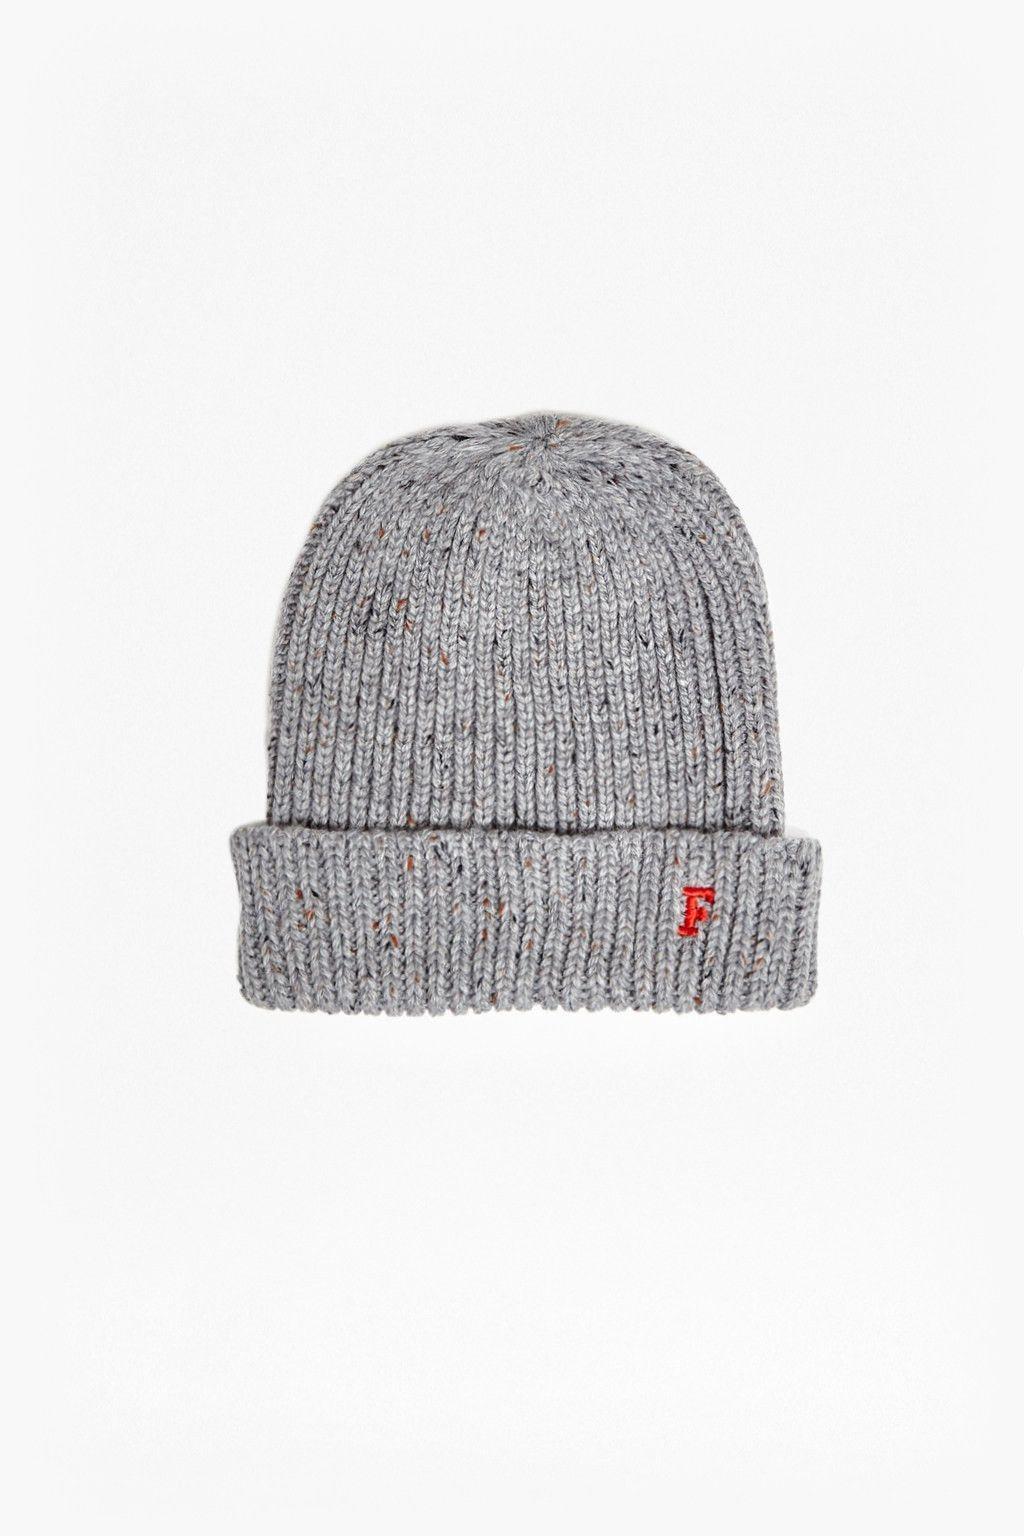 Knit Hat Grey